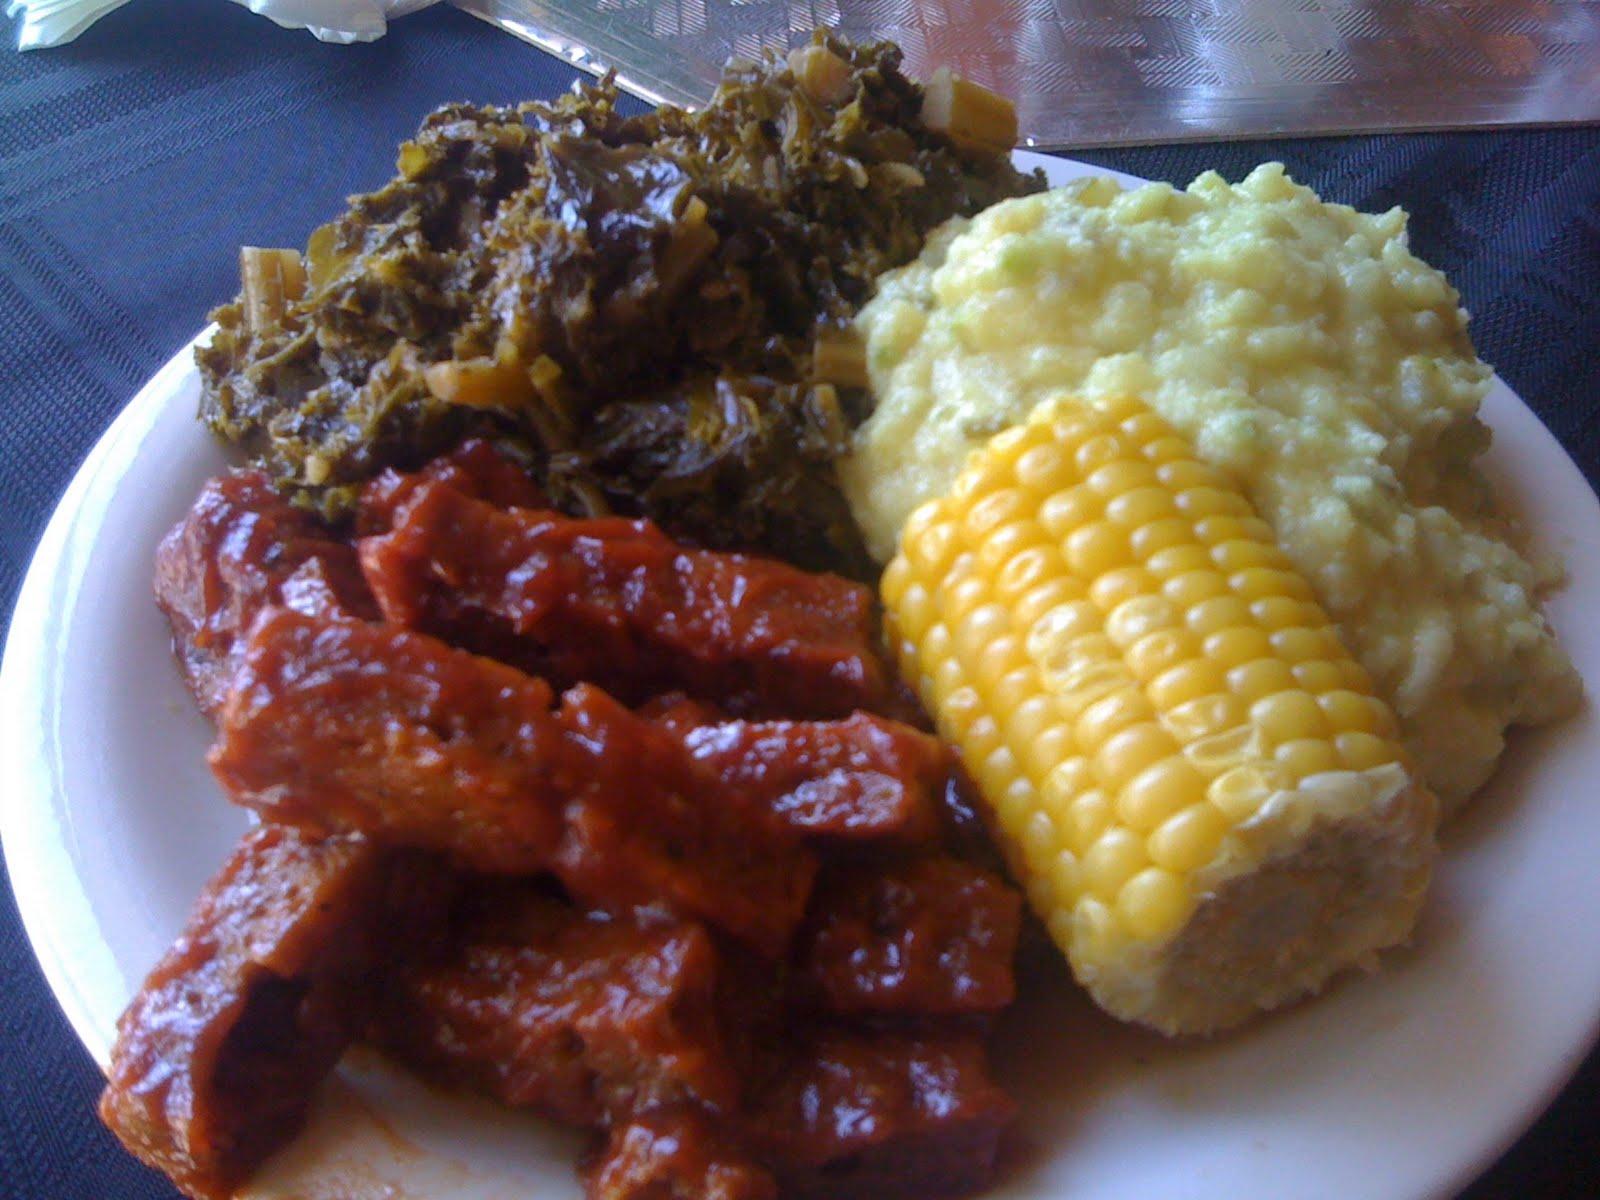 Original Soul Vegetarian - $$, South Side, Southern, Soul Food, Vegetarian, Vegan, Gluten-free